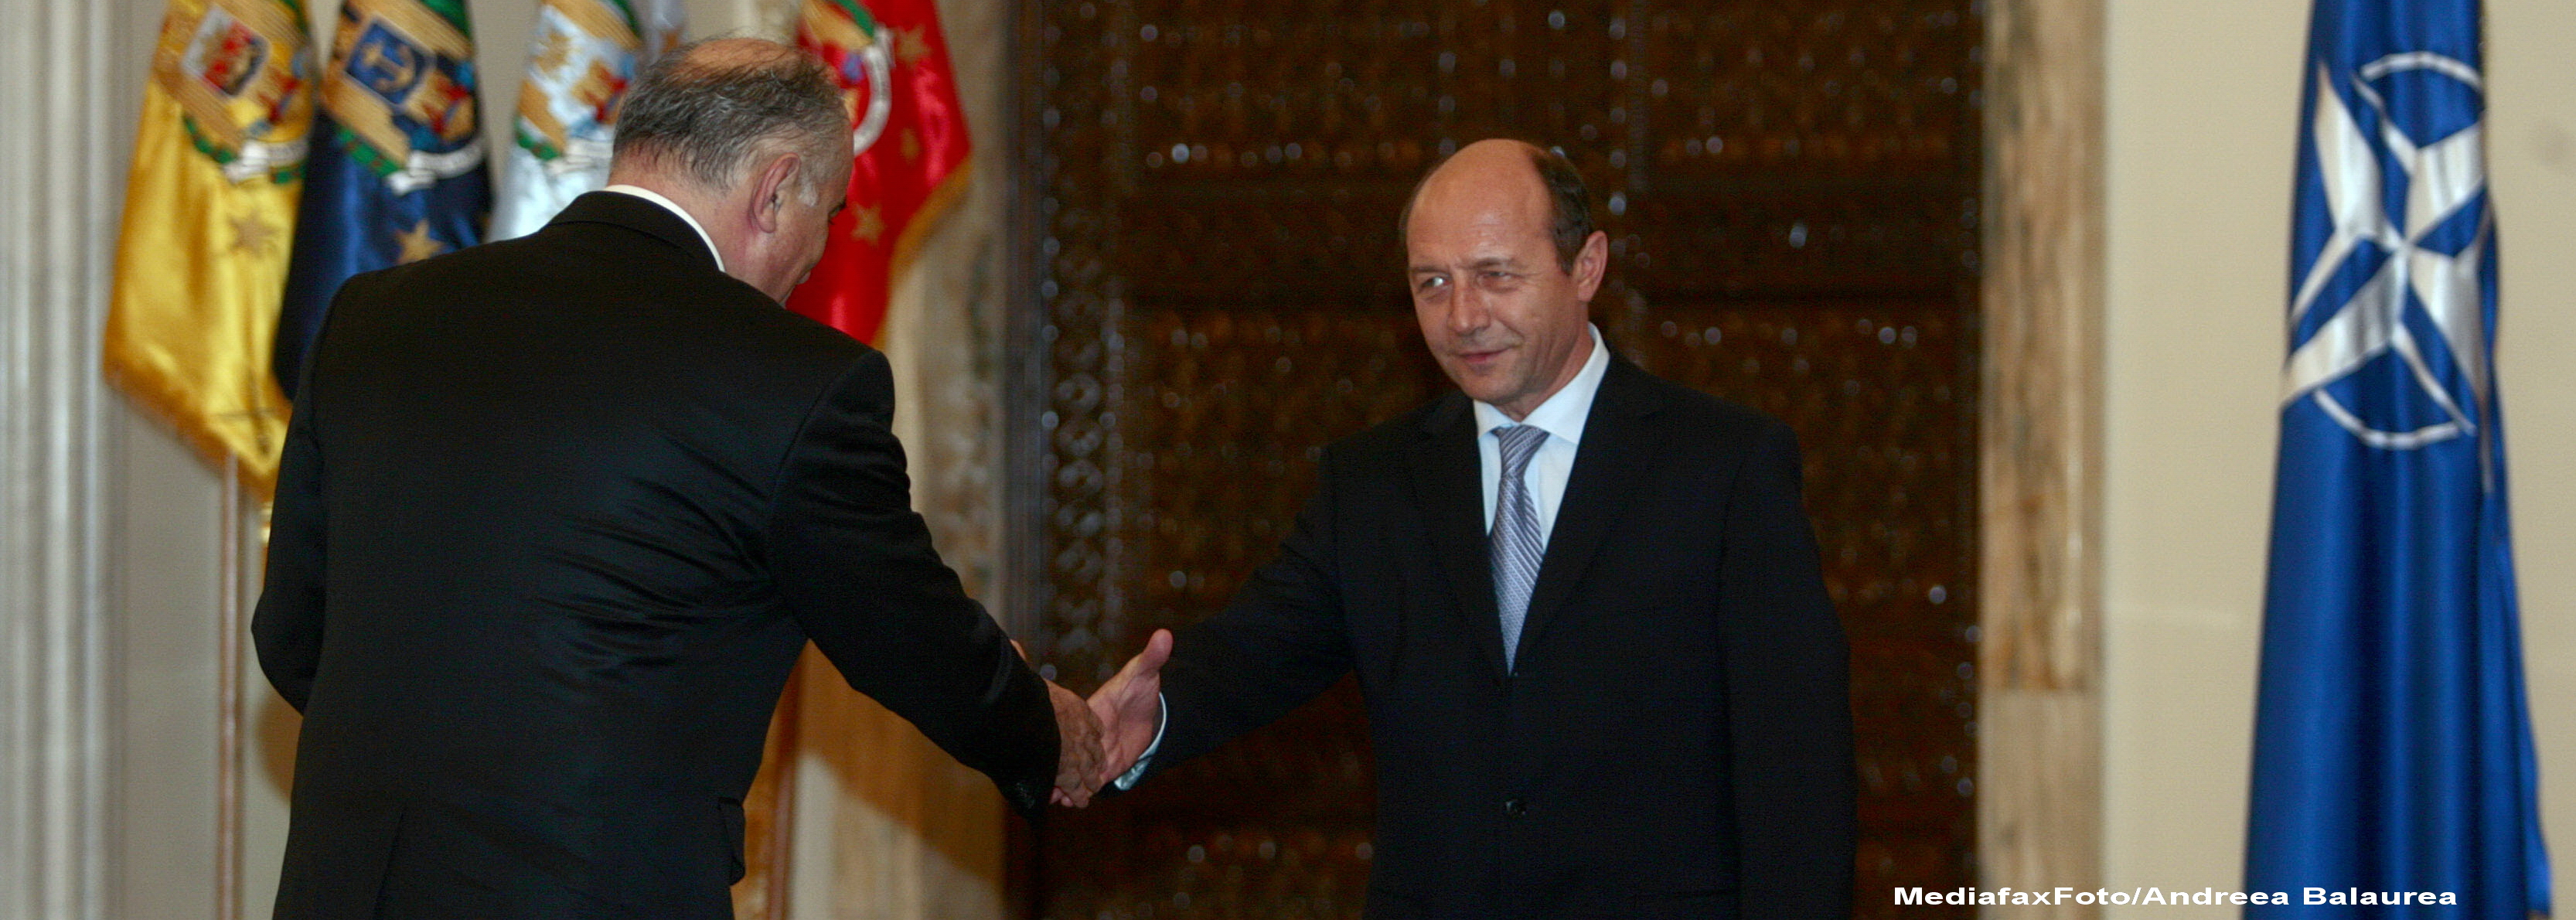 Scandalul Romgaz. Varujan Vosganian cere DIICOT sa fie audiat alaturi de Emil Boc si Traian Basescu